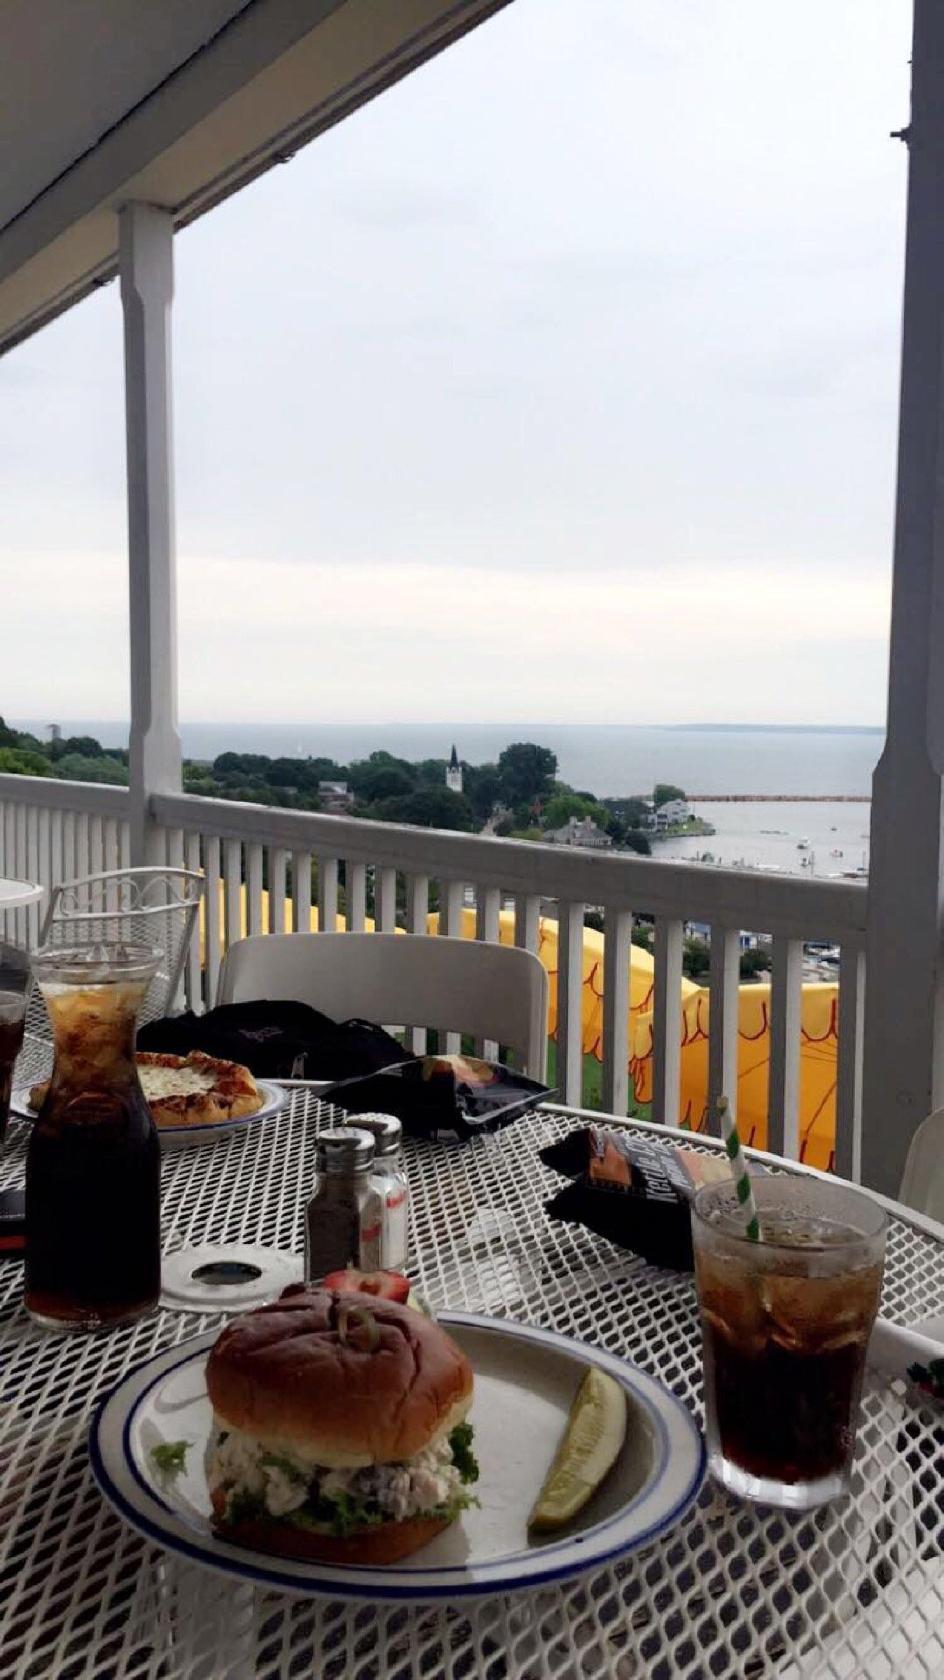 Fort Mackinac Tea Room photo